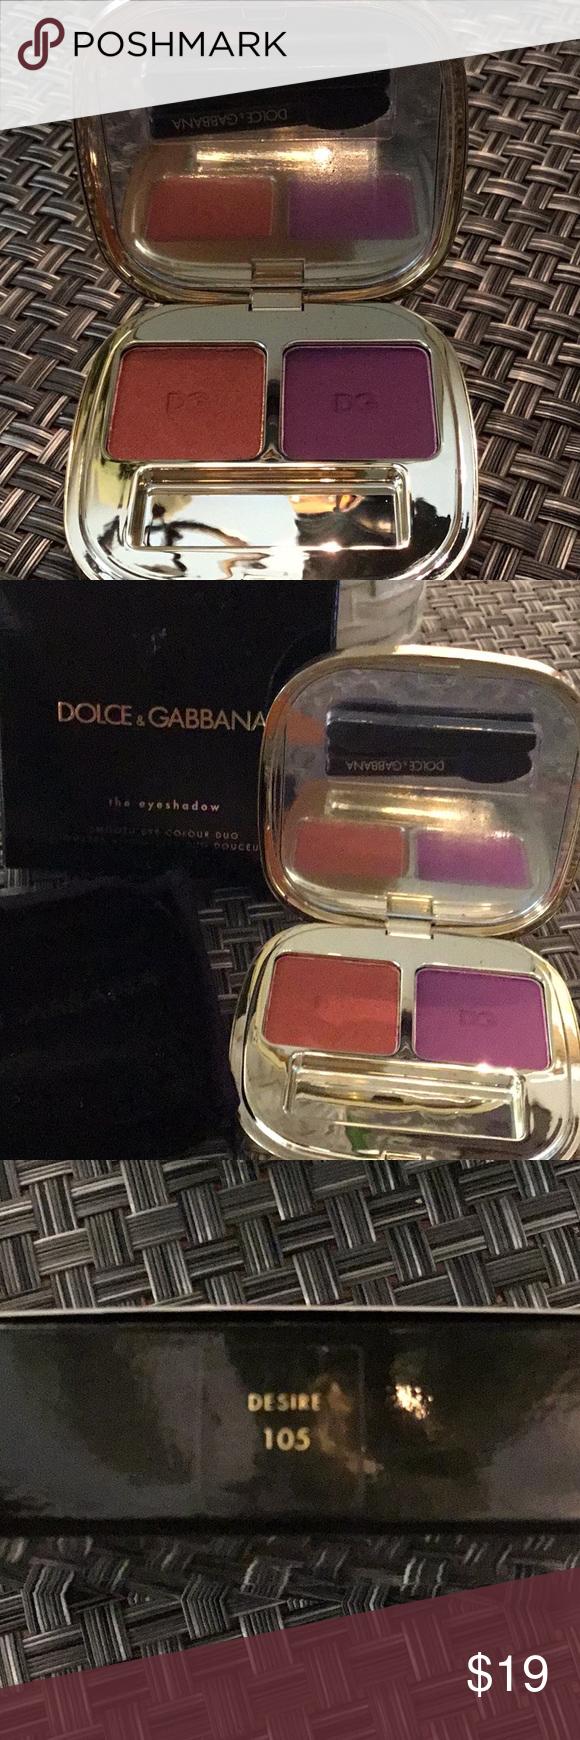 802ca36ff20 Dolce   Gabbana Eyeshadow Duo Desire 105 NWT NEW Dolce   Gabbana eyeshadow  duo Desire  105. Never used. Dolce   Gabbana Accessories